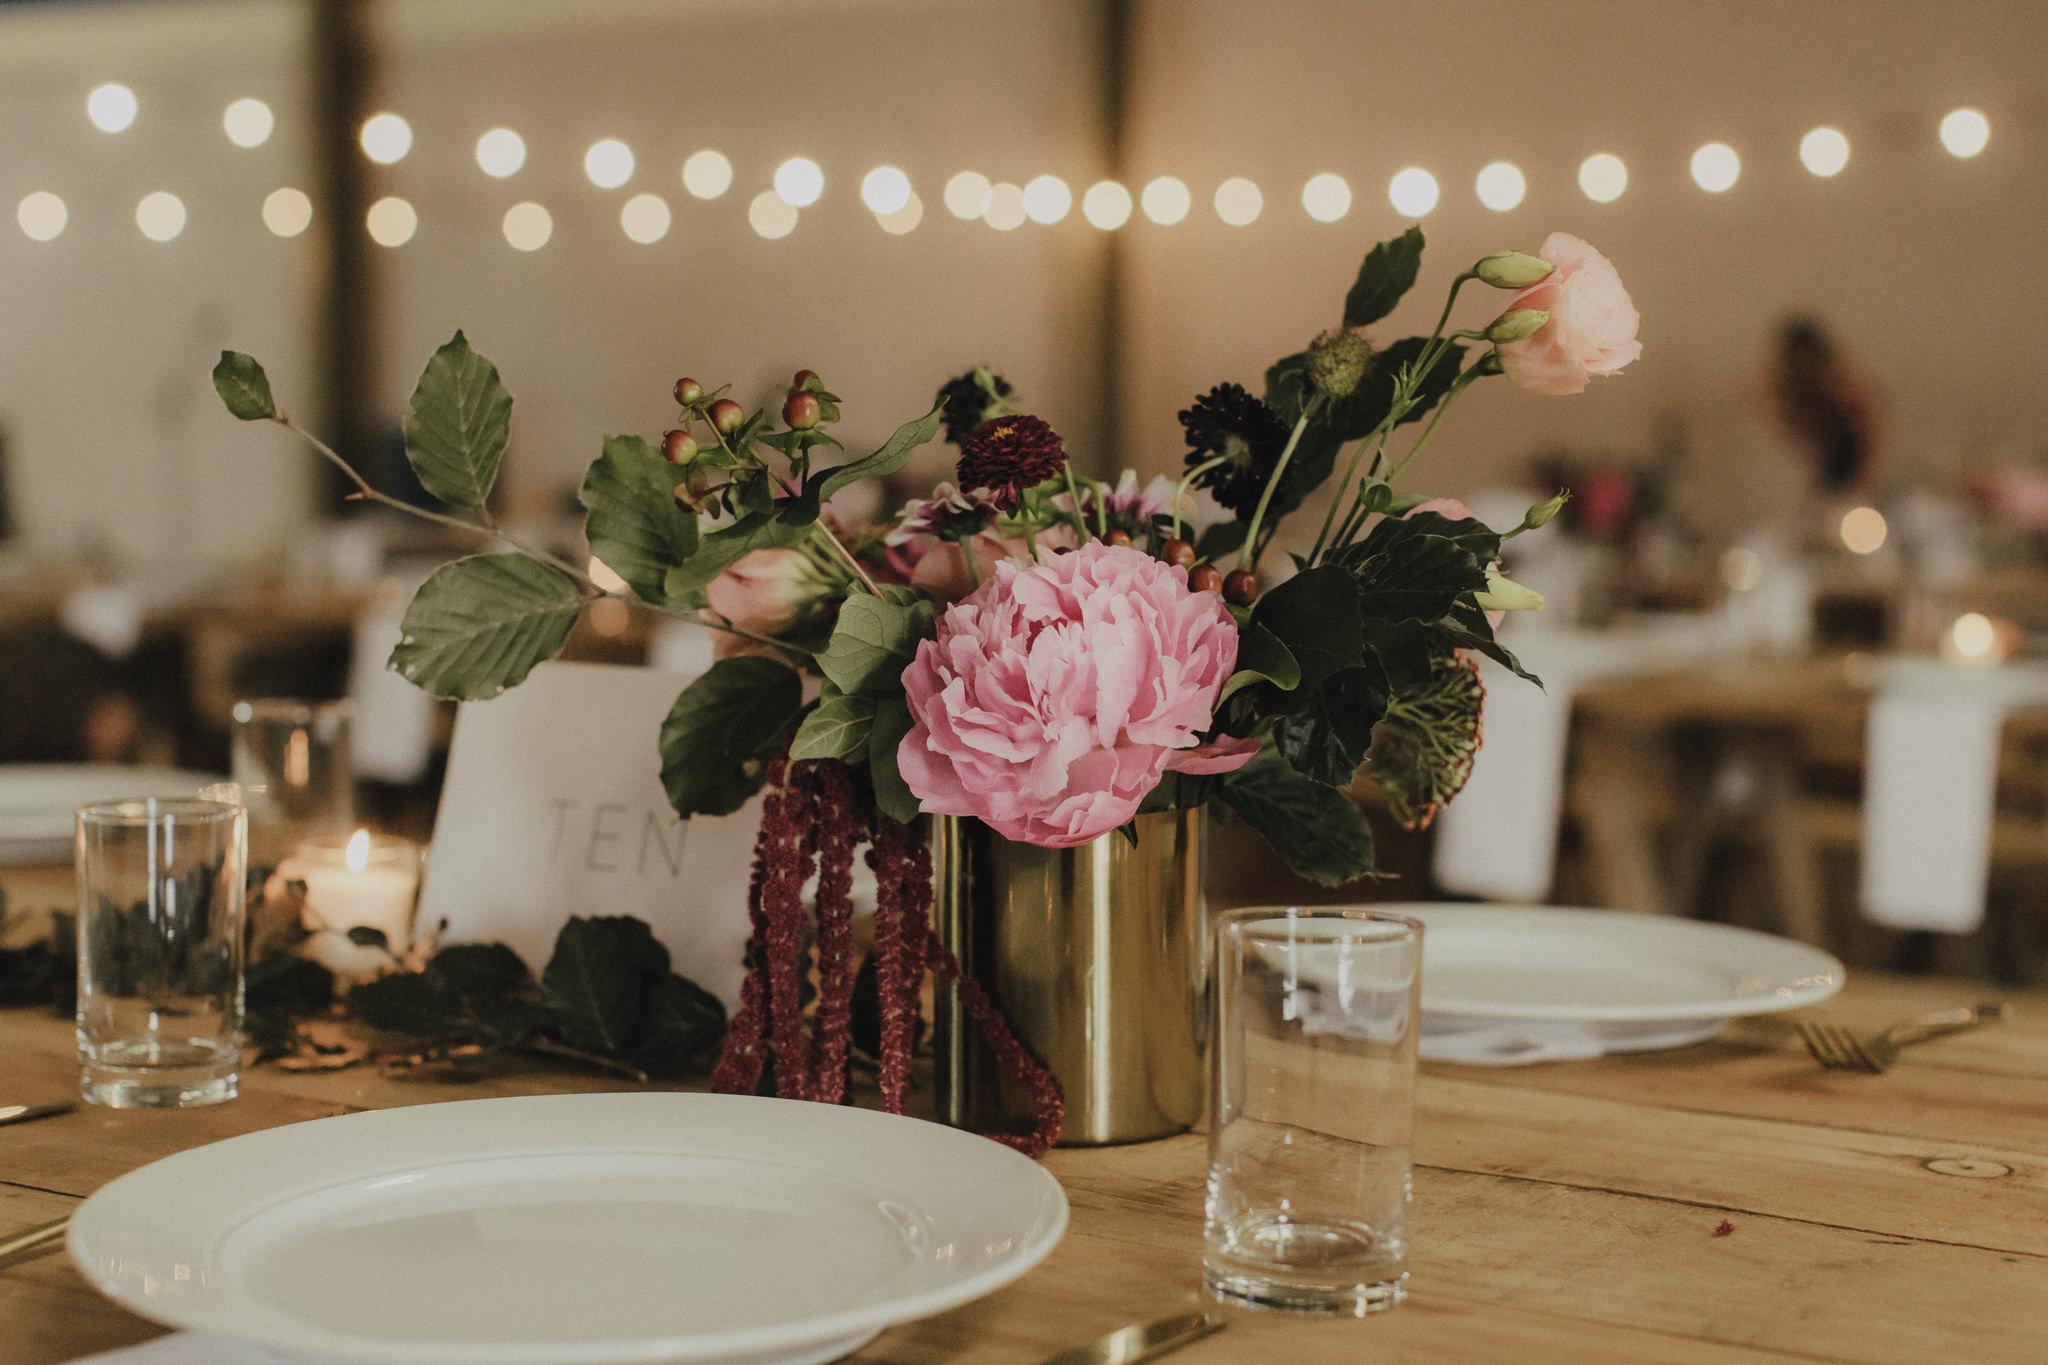 On My Hand Florist - Real wedding portfolio - Sasha and Josh - wedding reception table flowers